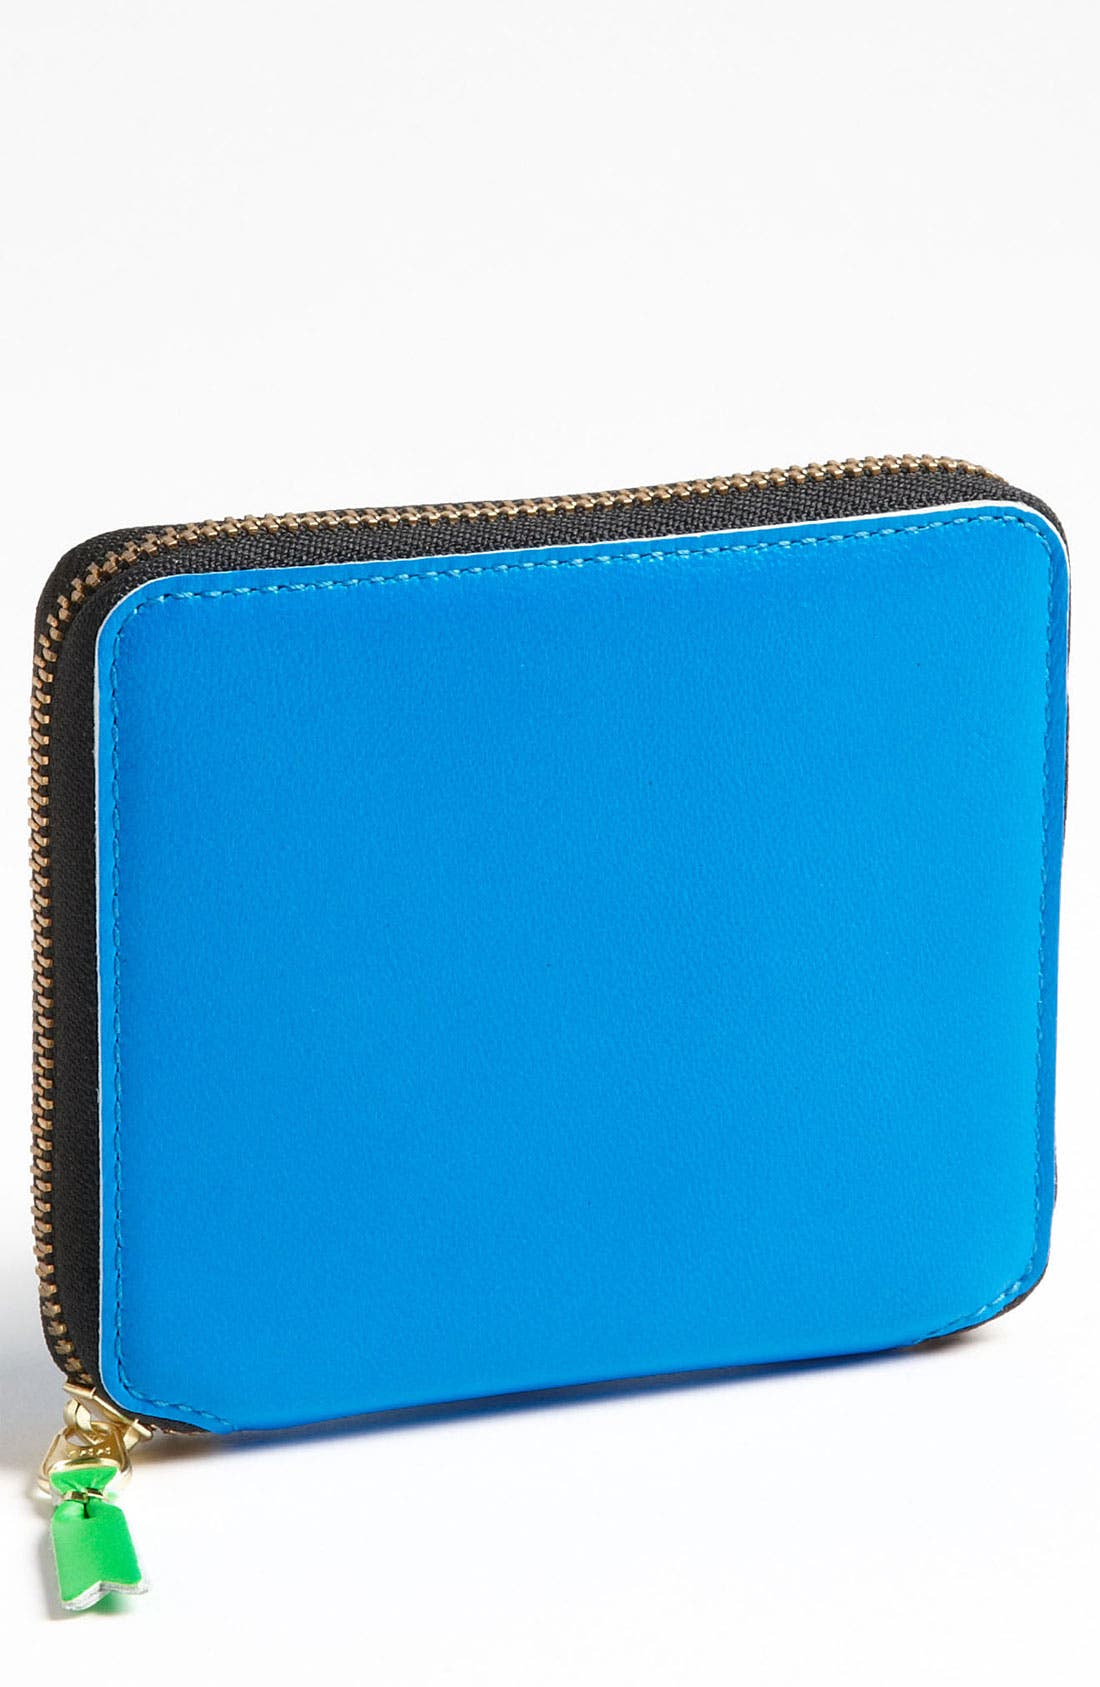 Main Image - Comme des Garçons 'Super Fluo' Zip Around Wallet